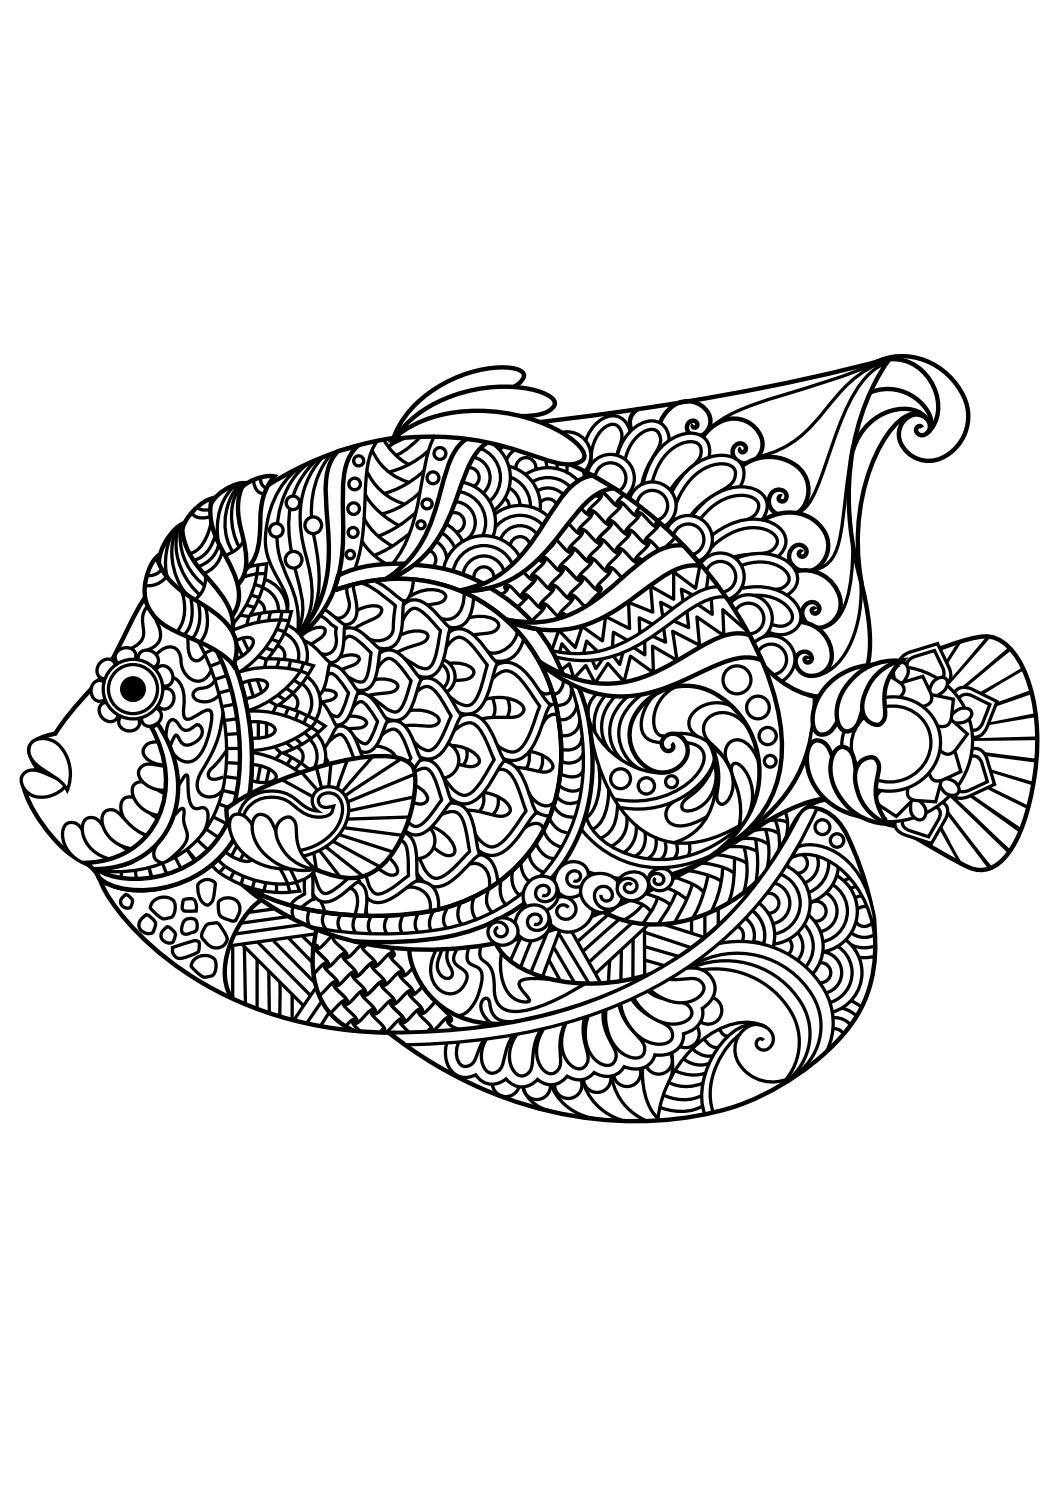 Animal coloring pages pdf diana pinterest színezőlapok rajzok